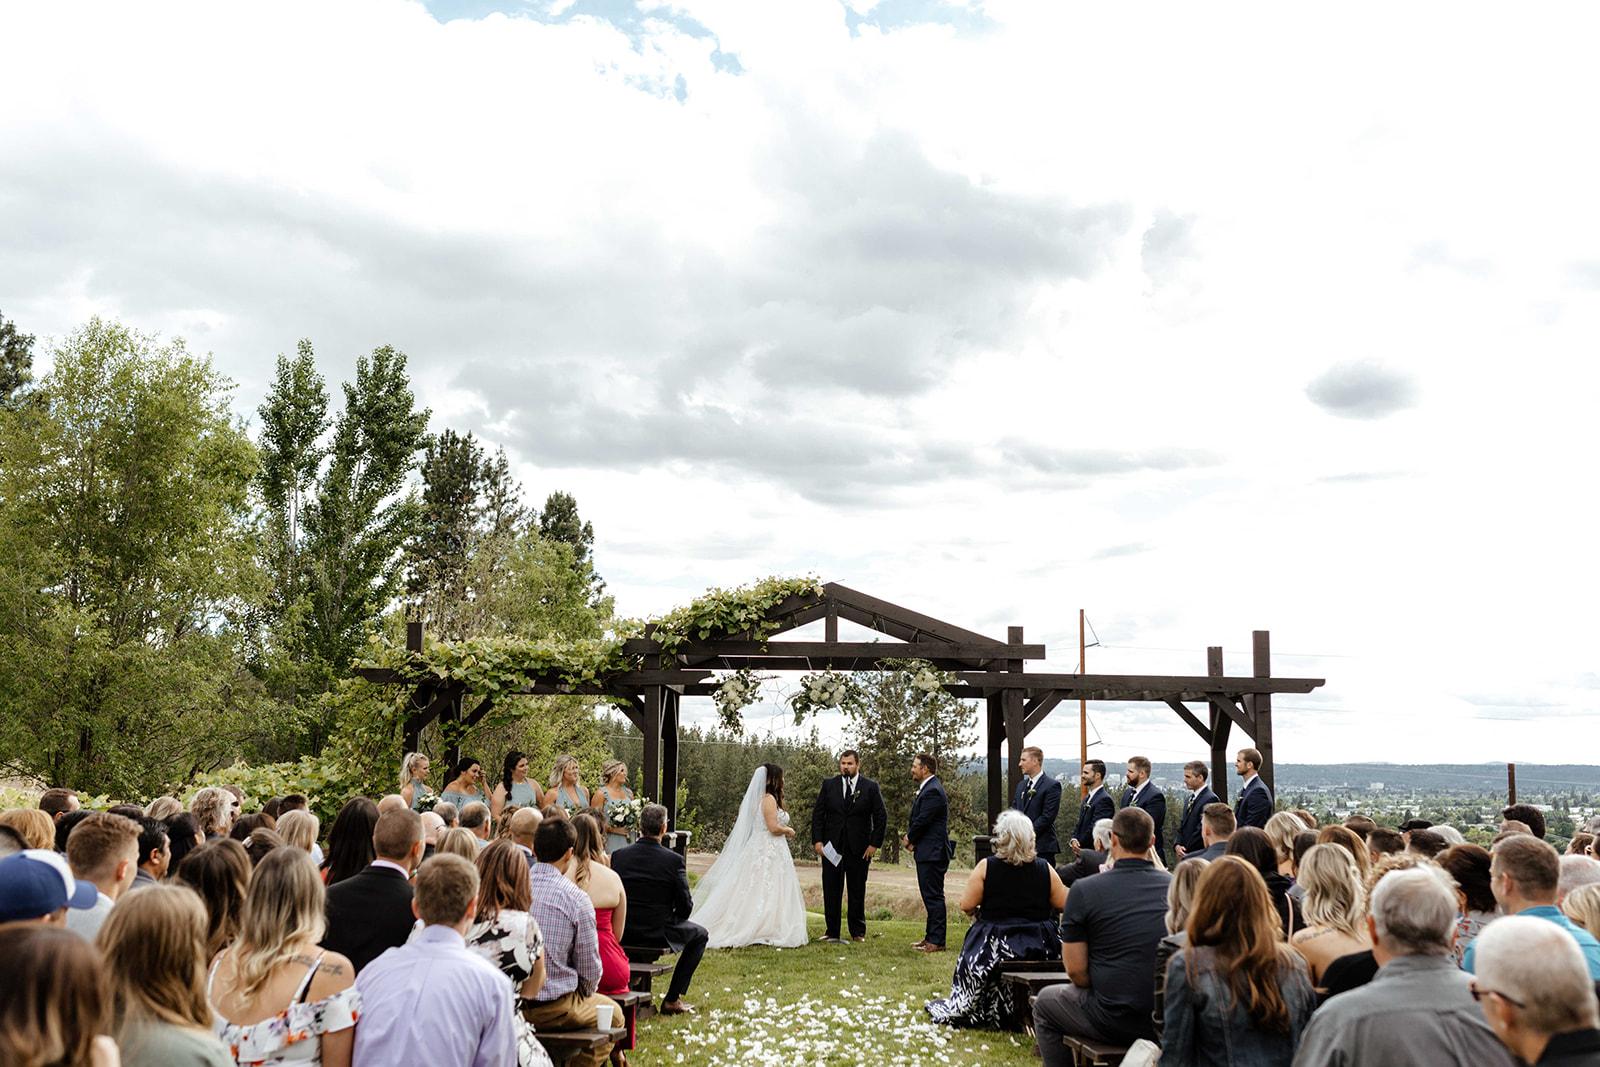 beacon hill wedding honest in ivory dress spokane ceremony